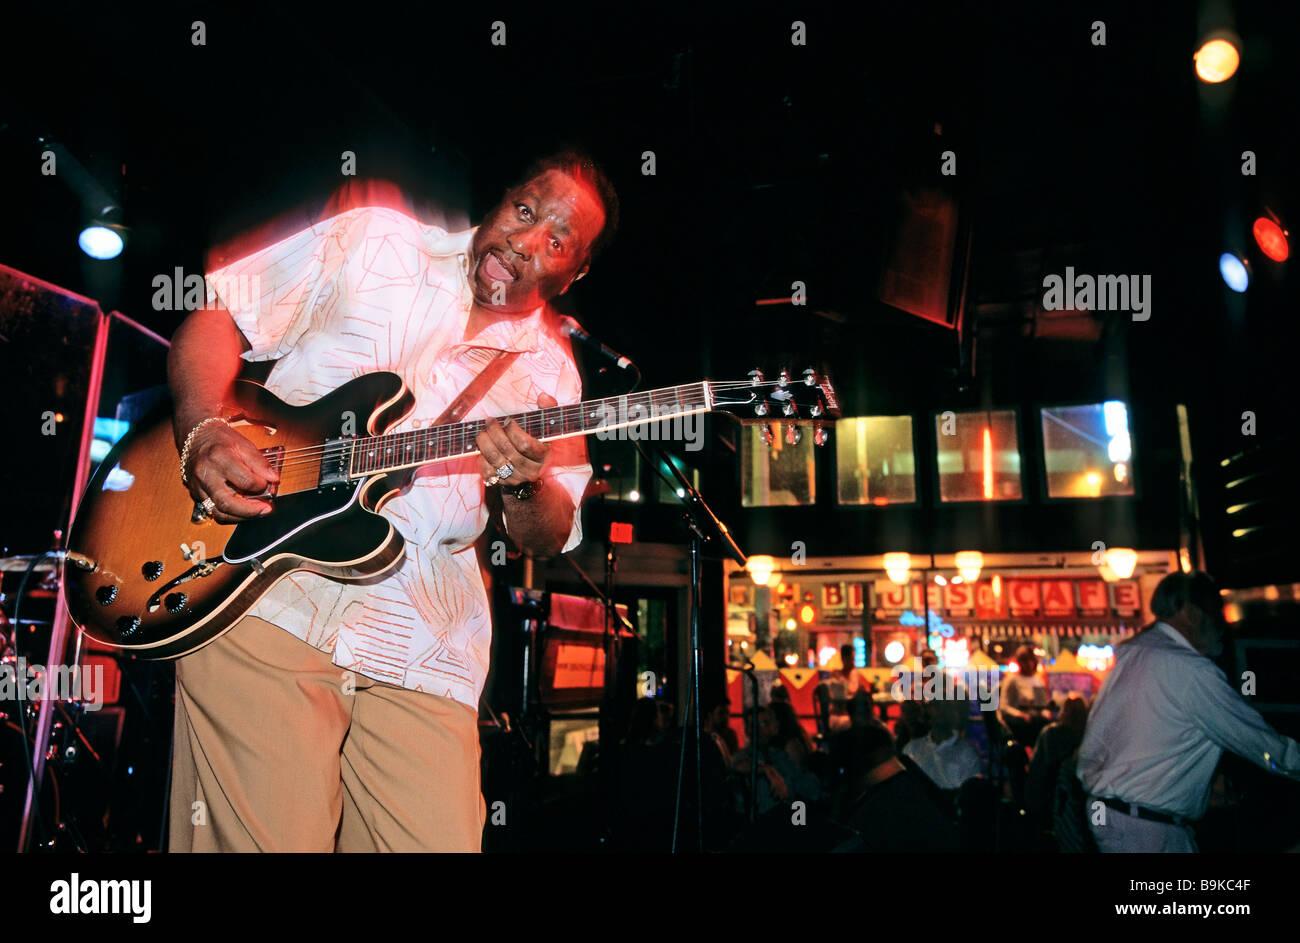 United States, Tennessee, Memphis, Beale Street, B.B. King's Blues club, Bluesman Preston Shannon playing Stock Photo